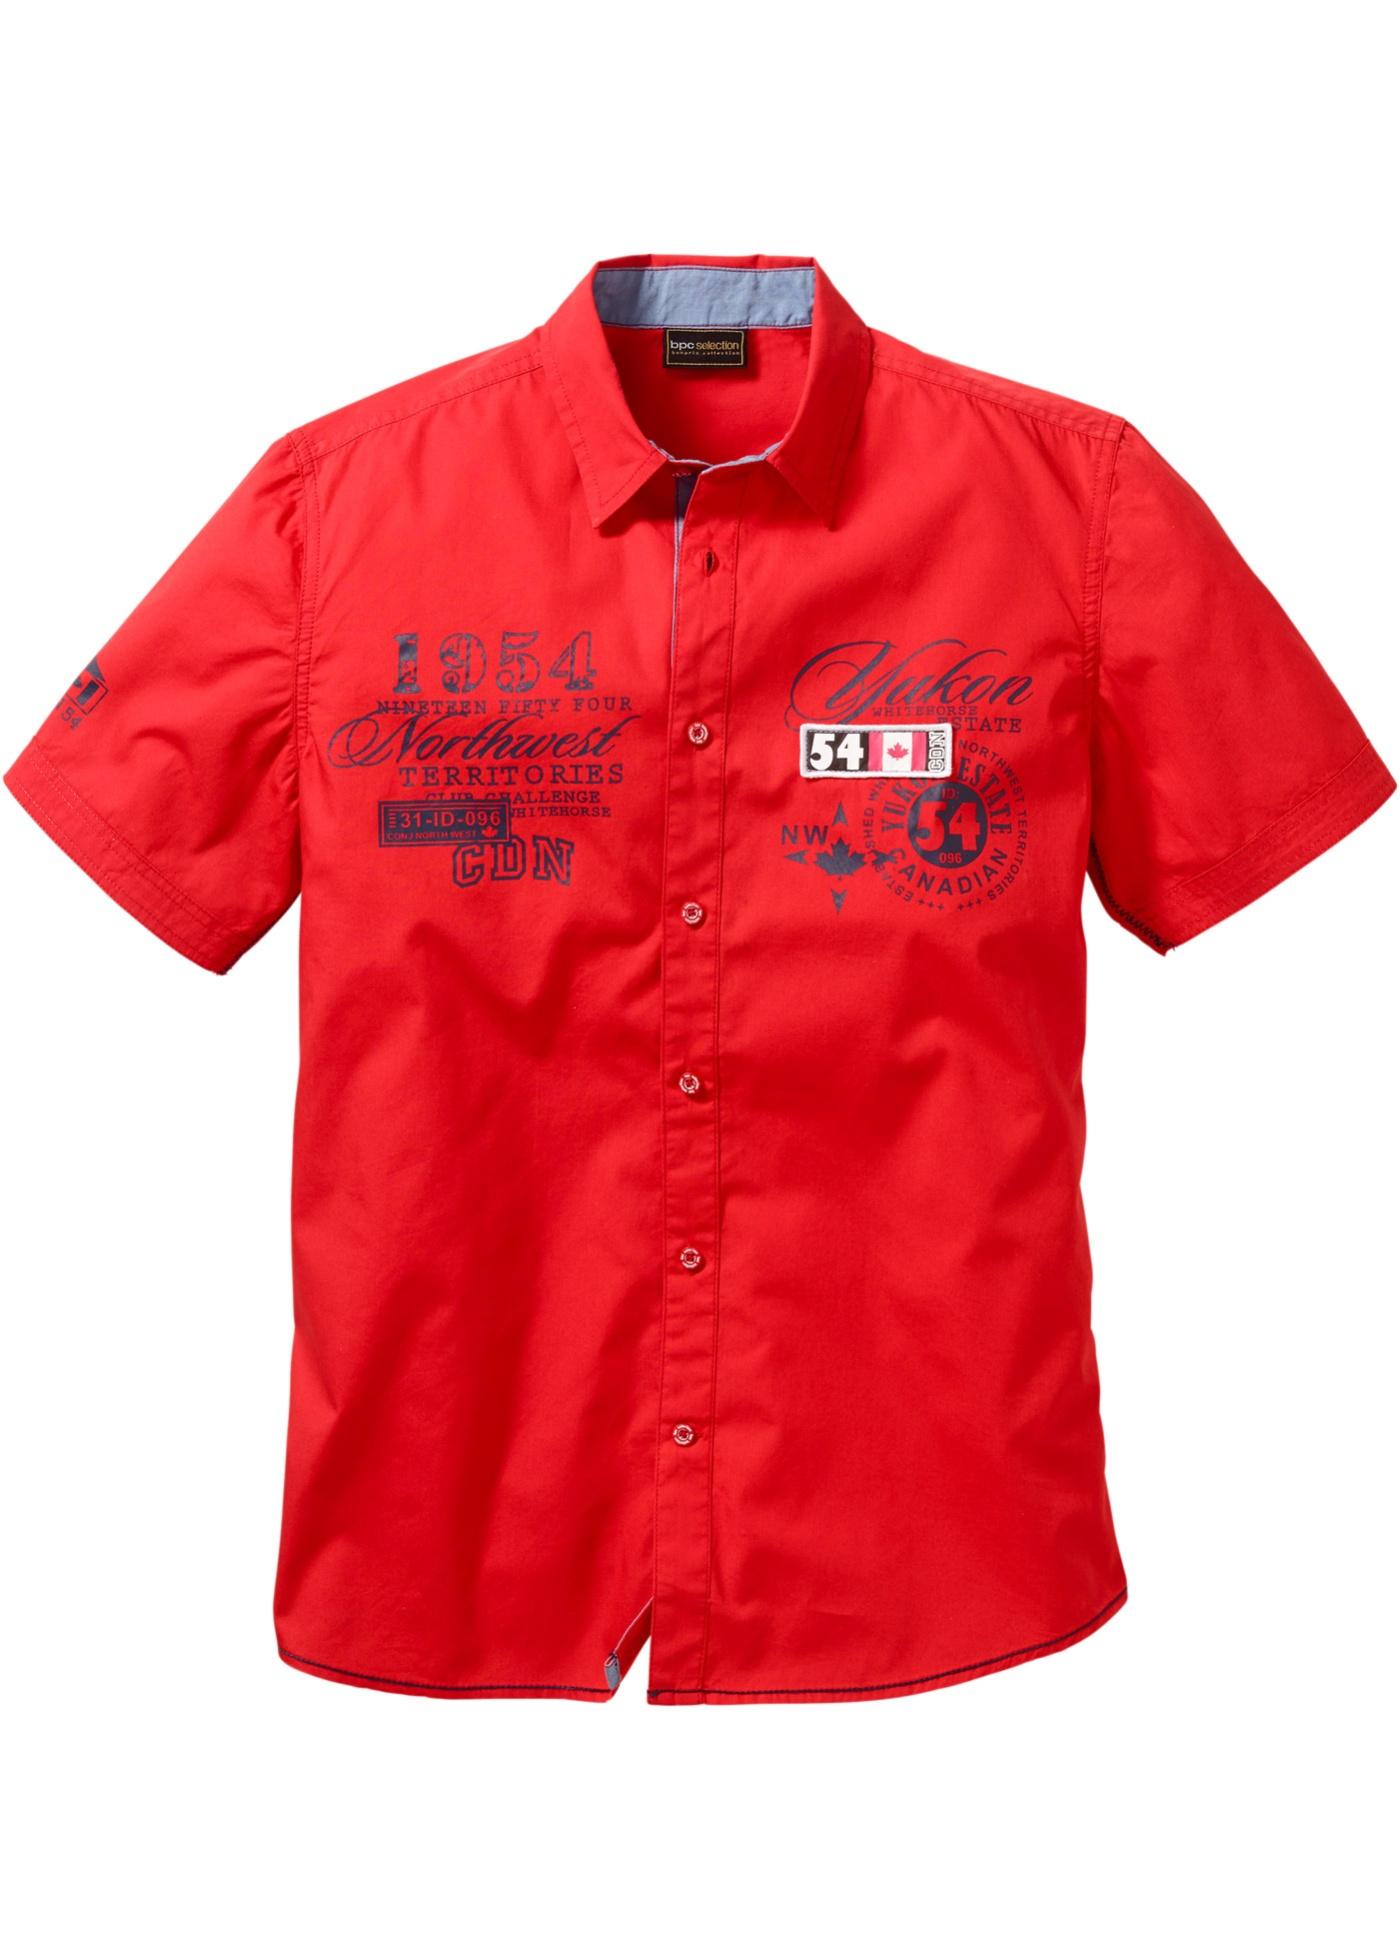 86485291f7c2 ... med tabletter Orkidé 99.00 Bonprix SE - Kortärmad skjorta 149.00 ...